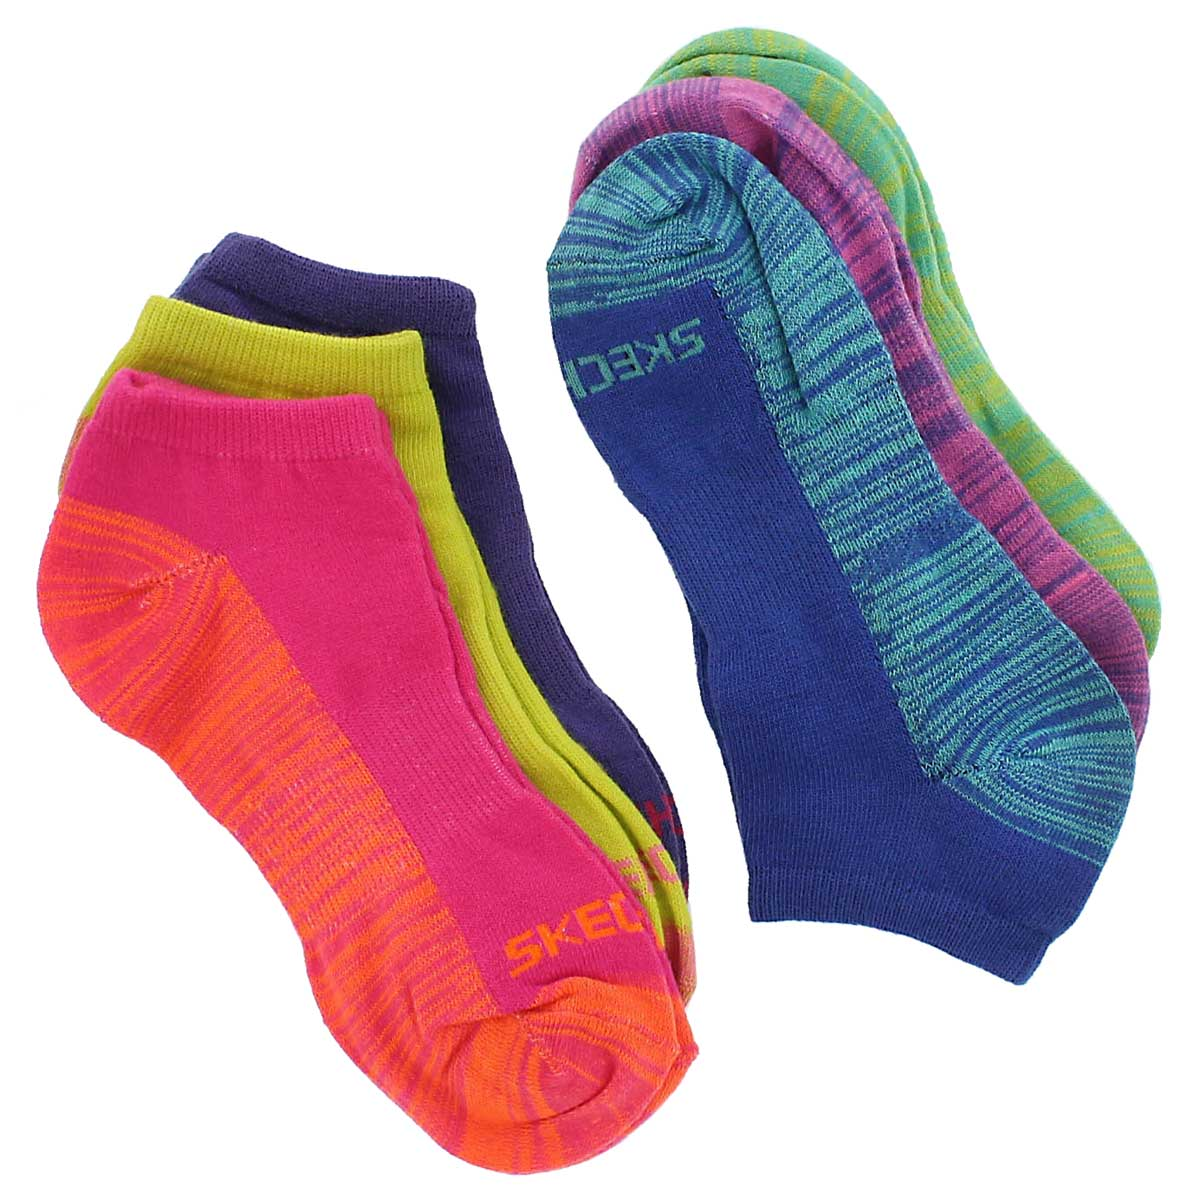 Socquettes LOW CUT, multi, 6 paires, fil